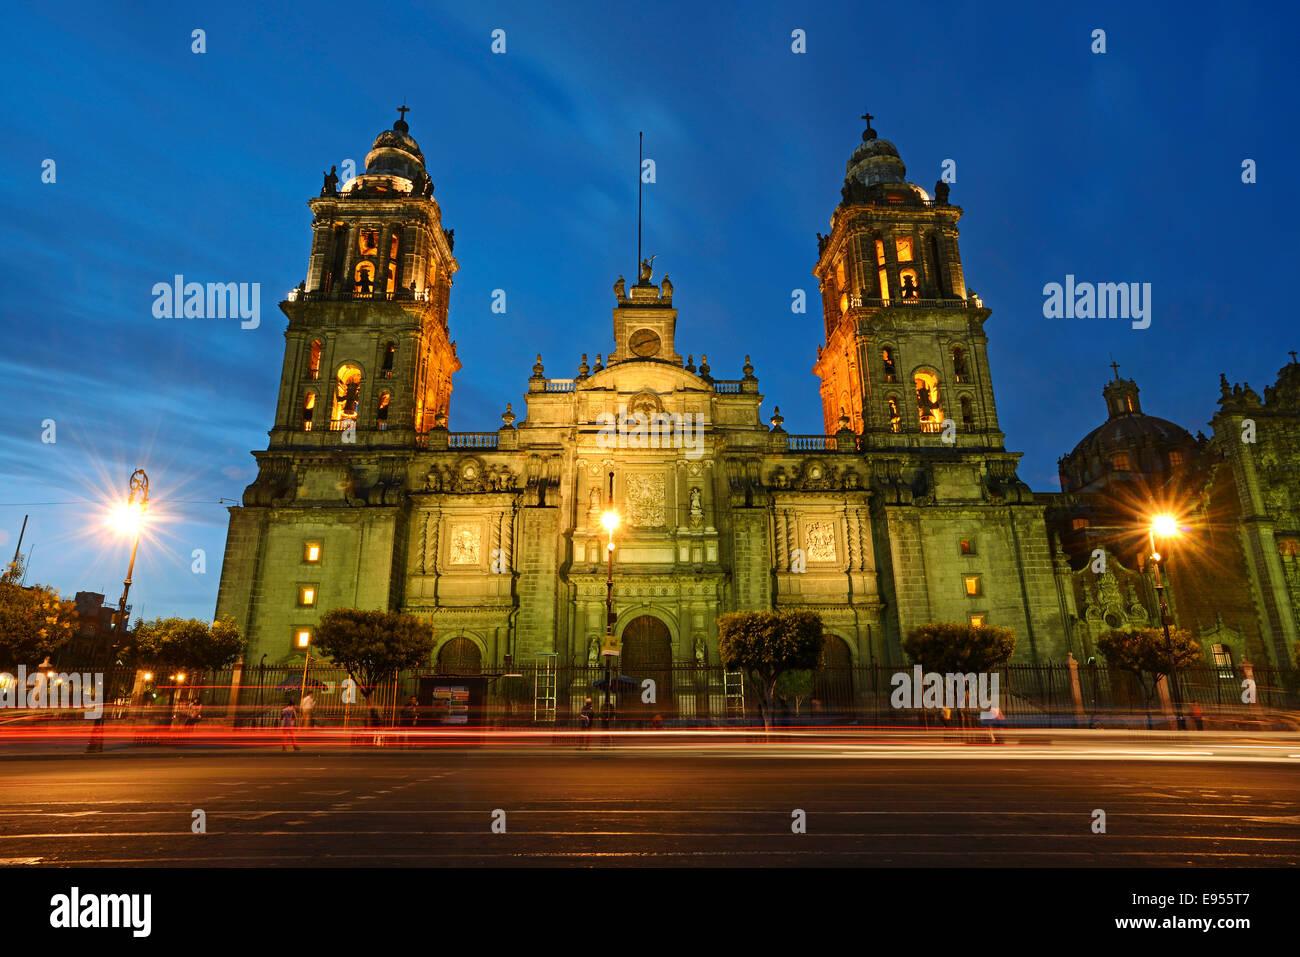 Città del Messico Cattedrale Metropolitana, Catedral Metropolitana de la Asunción de Maria, Plaza de la Immagini Stock